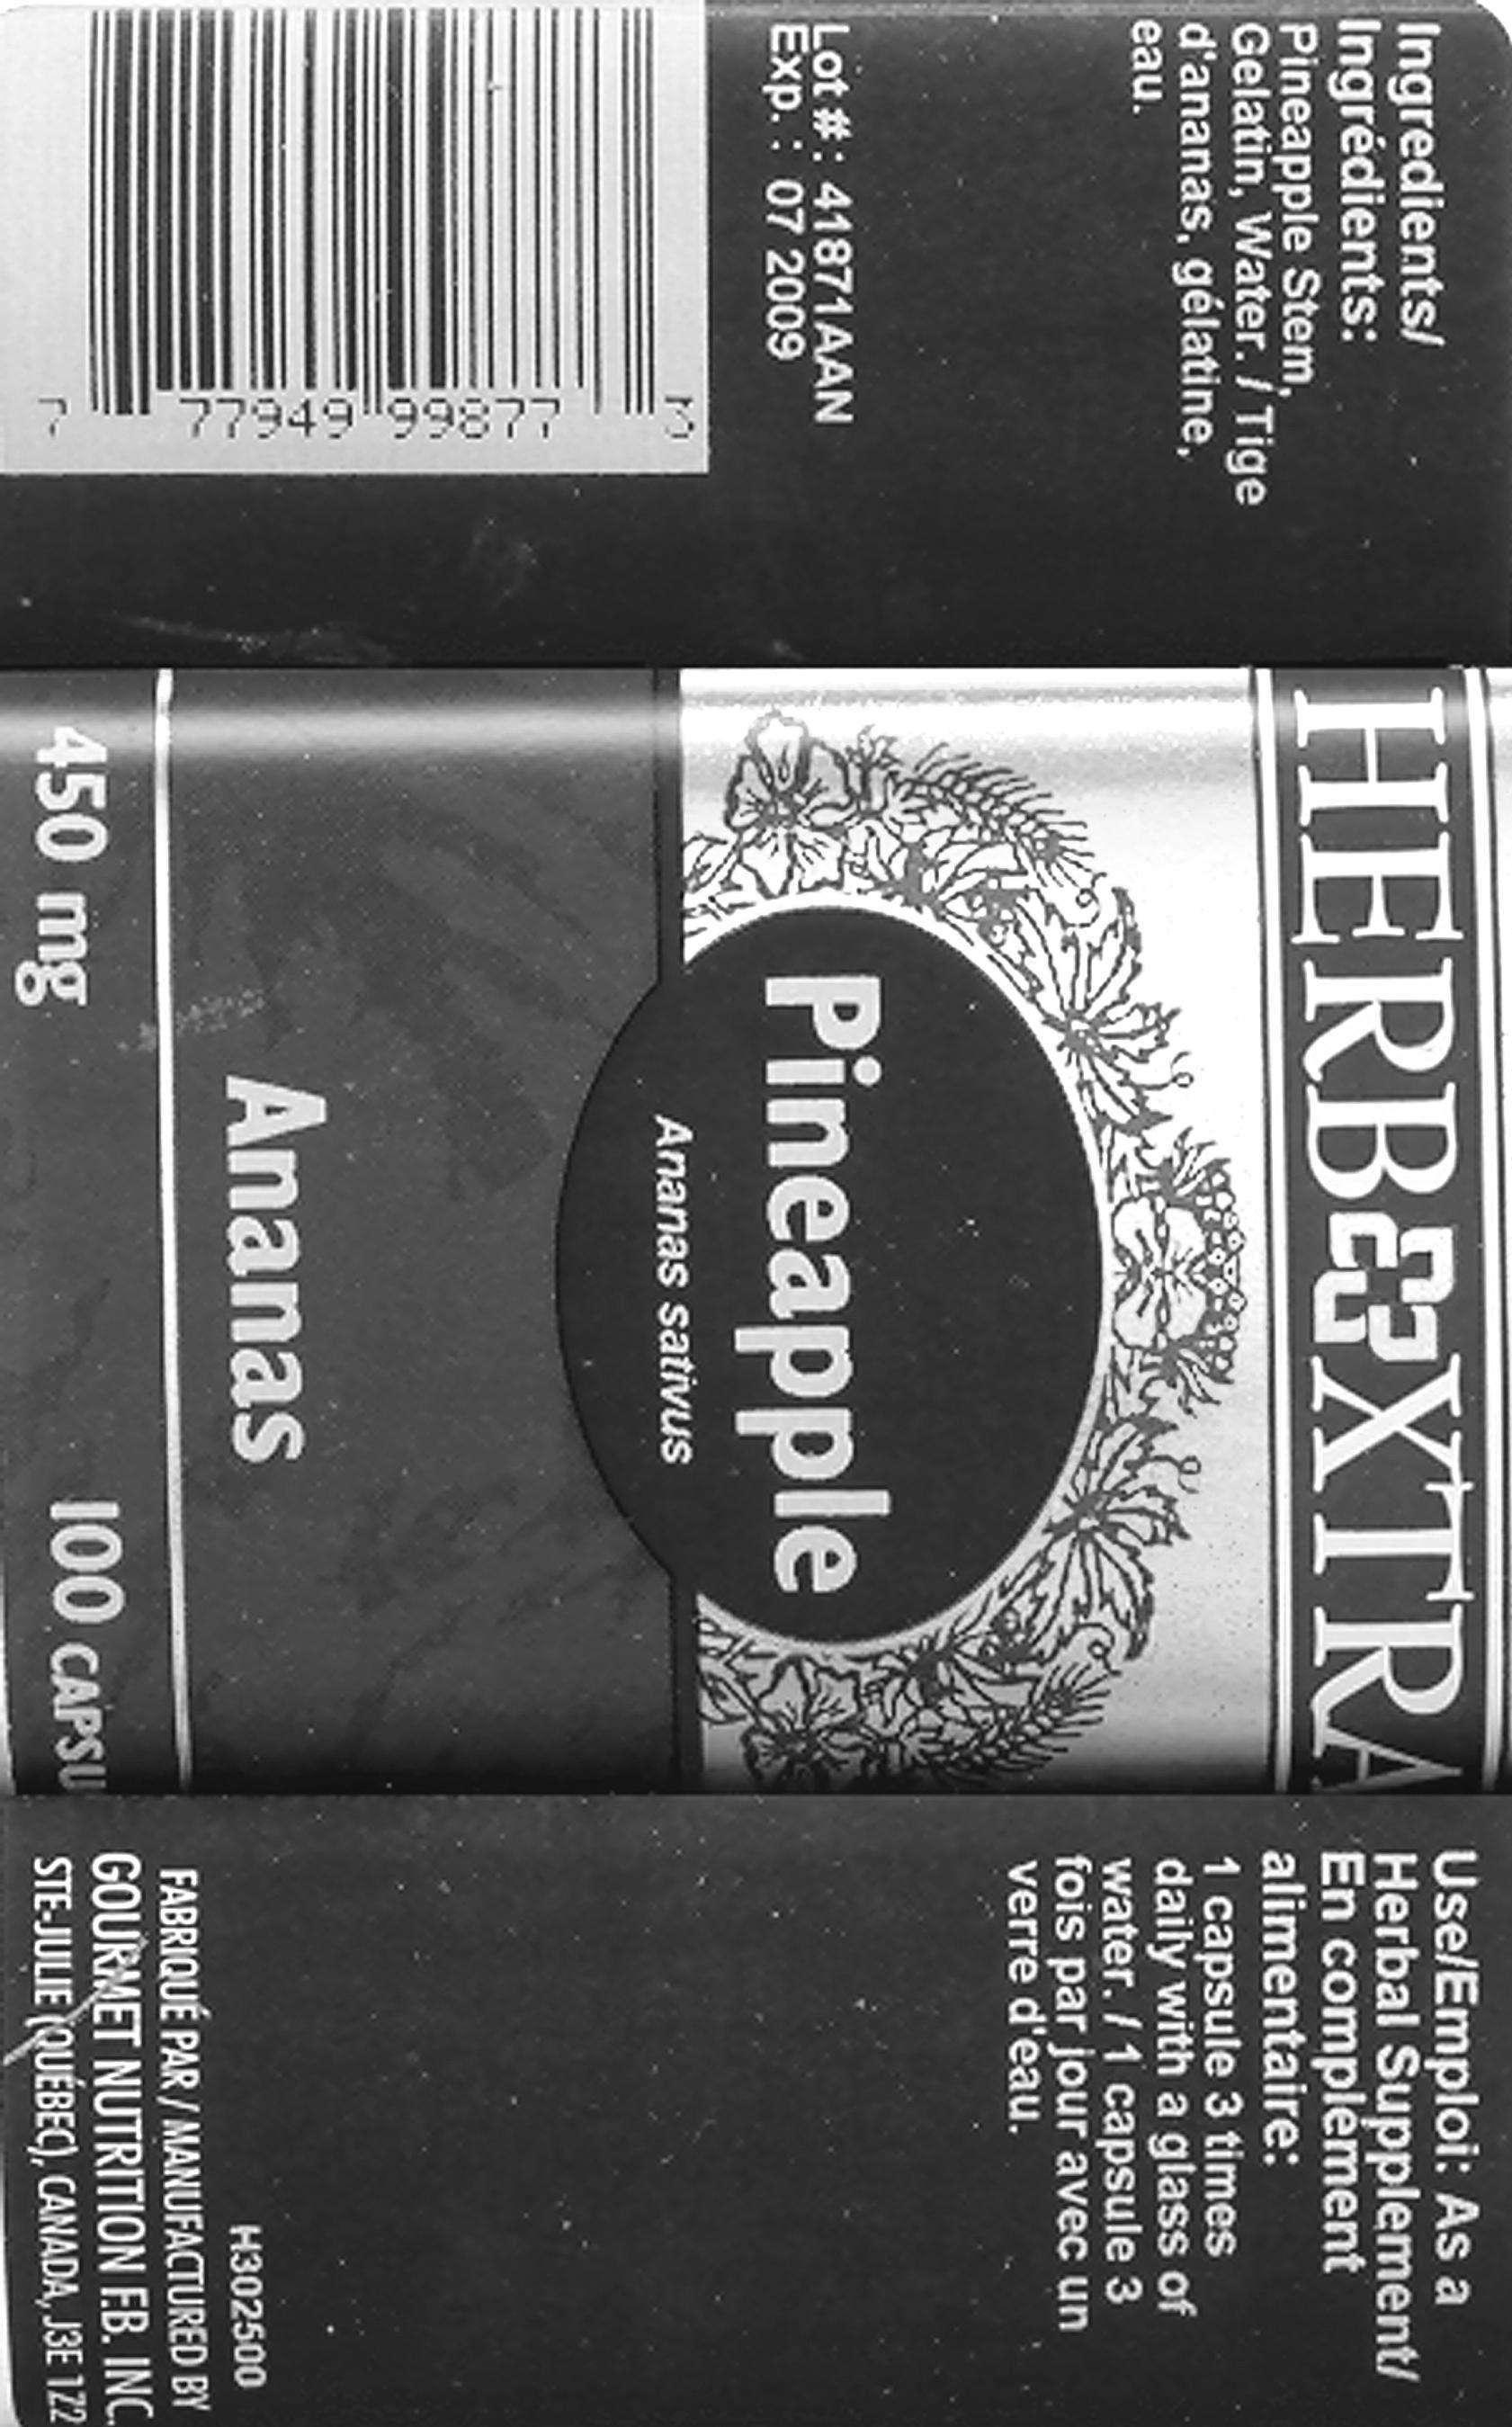 Pineapple Stem 450 mg - Label